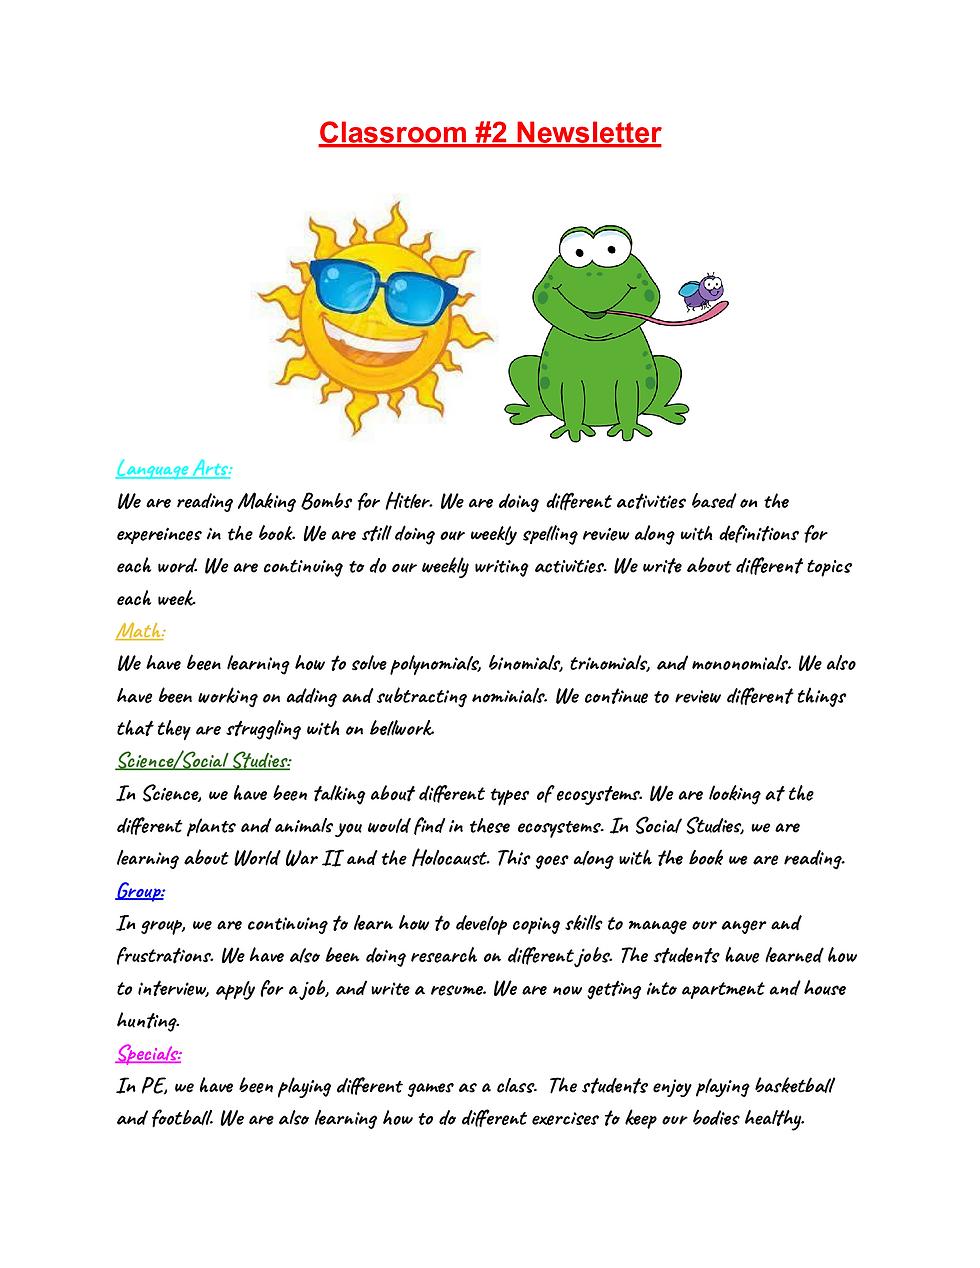 Classroom-_2-Newsletter-4Q.png